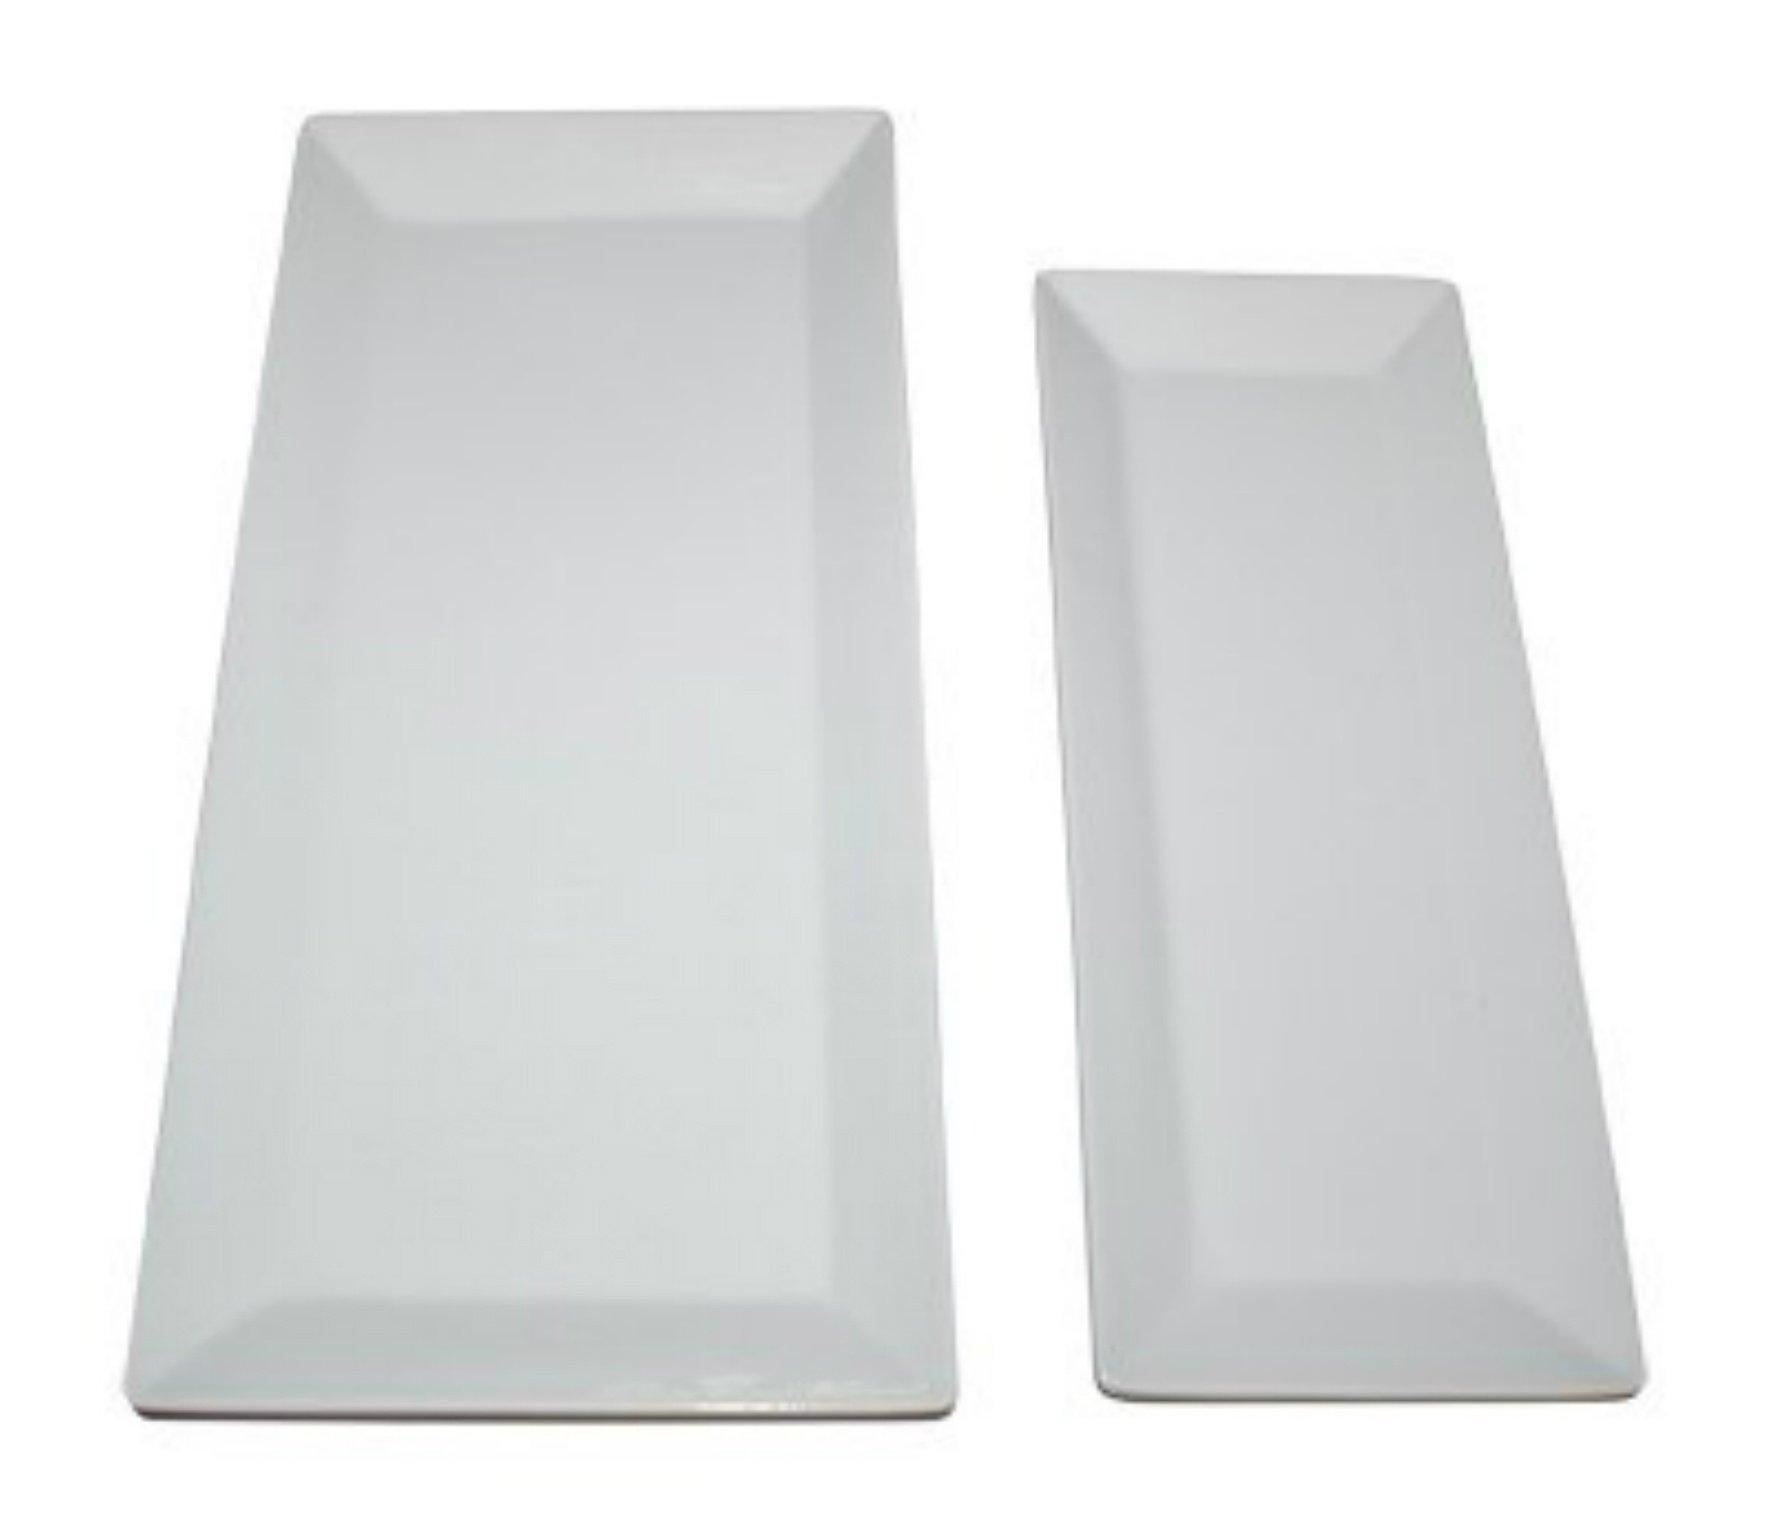 Large Rectangular Serving Platters - Set of 2 Trays, White Porcelain Ceramic Platter Sizes 15'' x 7'' and 12'' x 5''